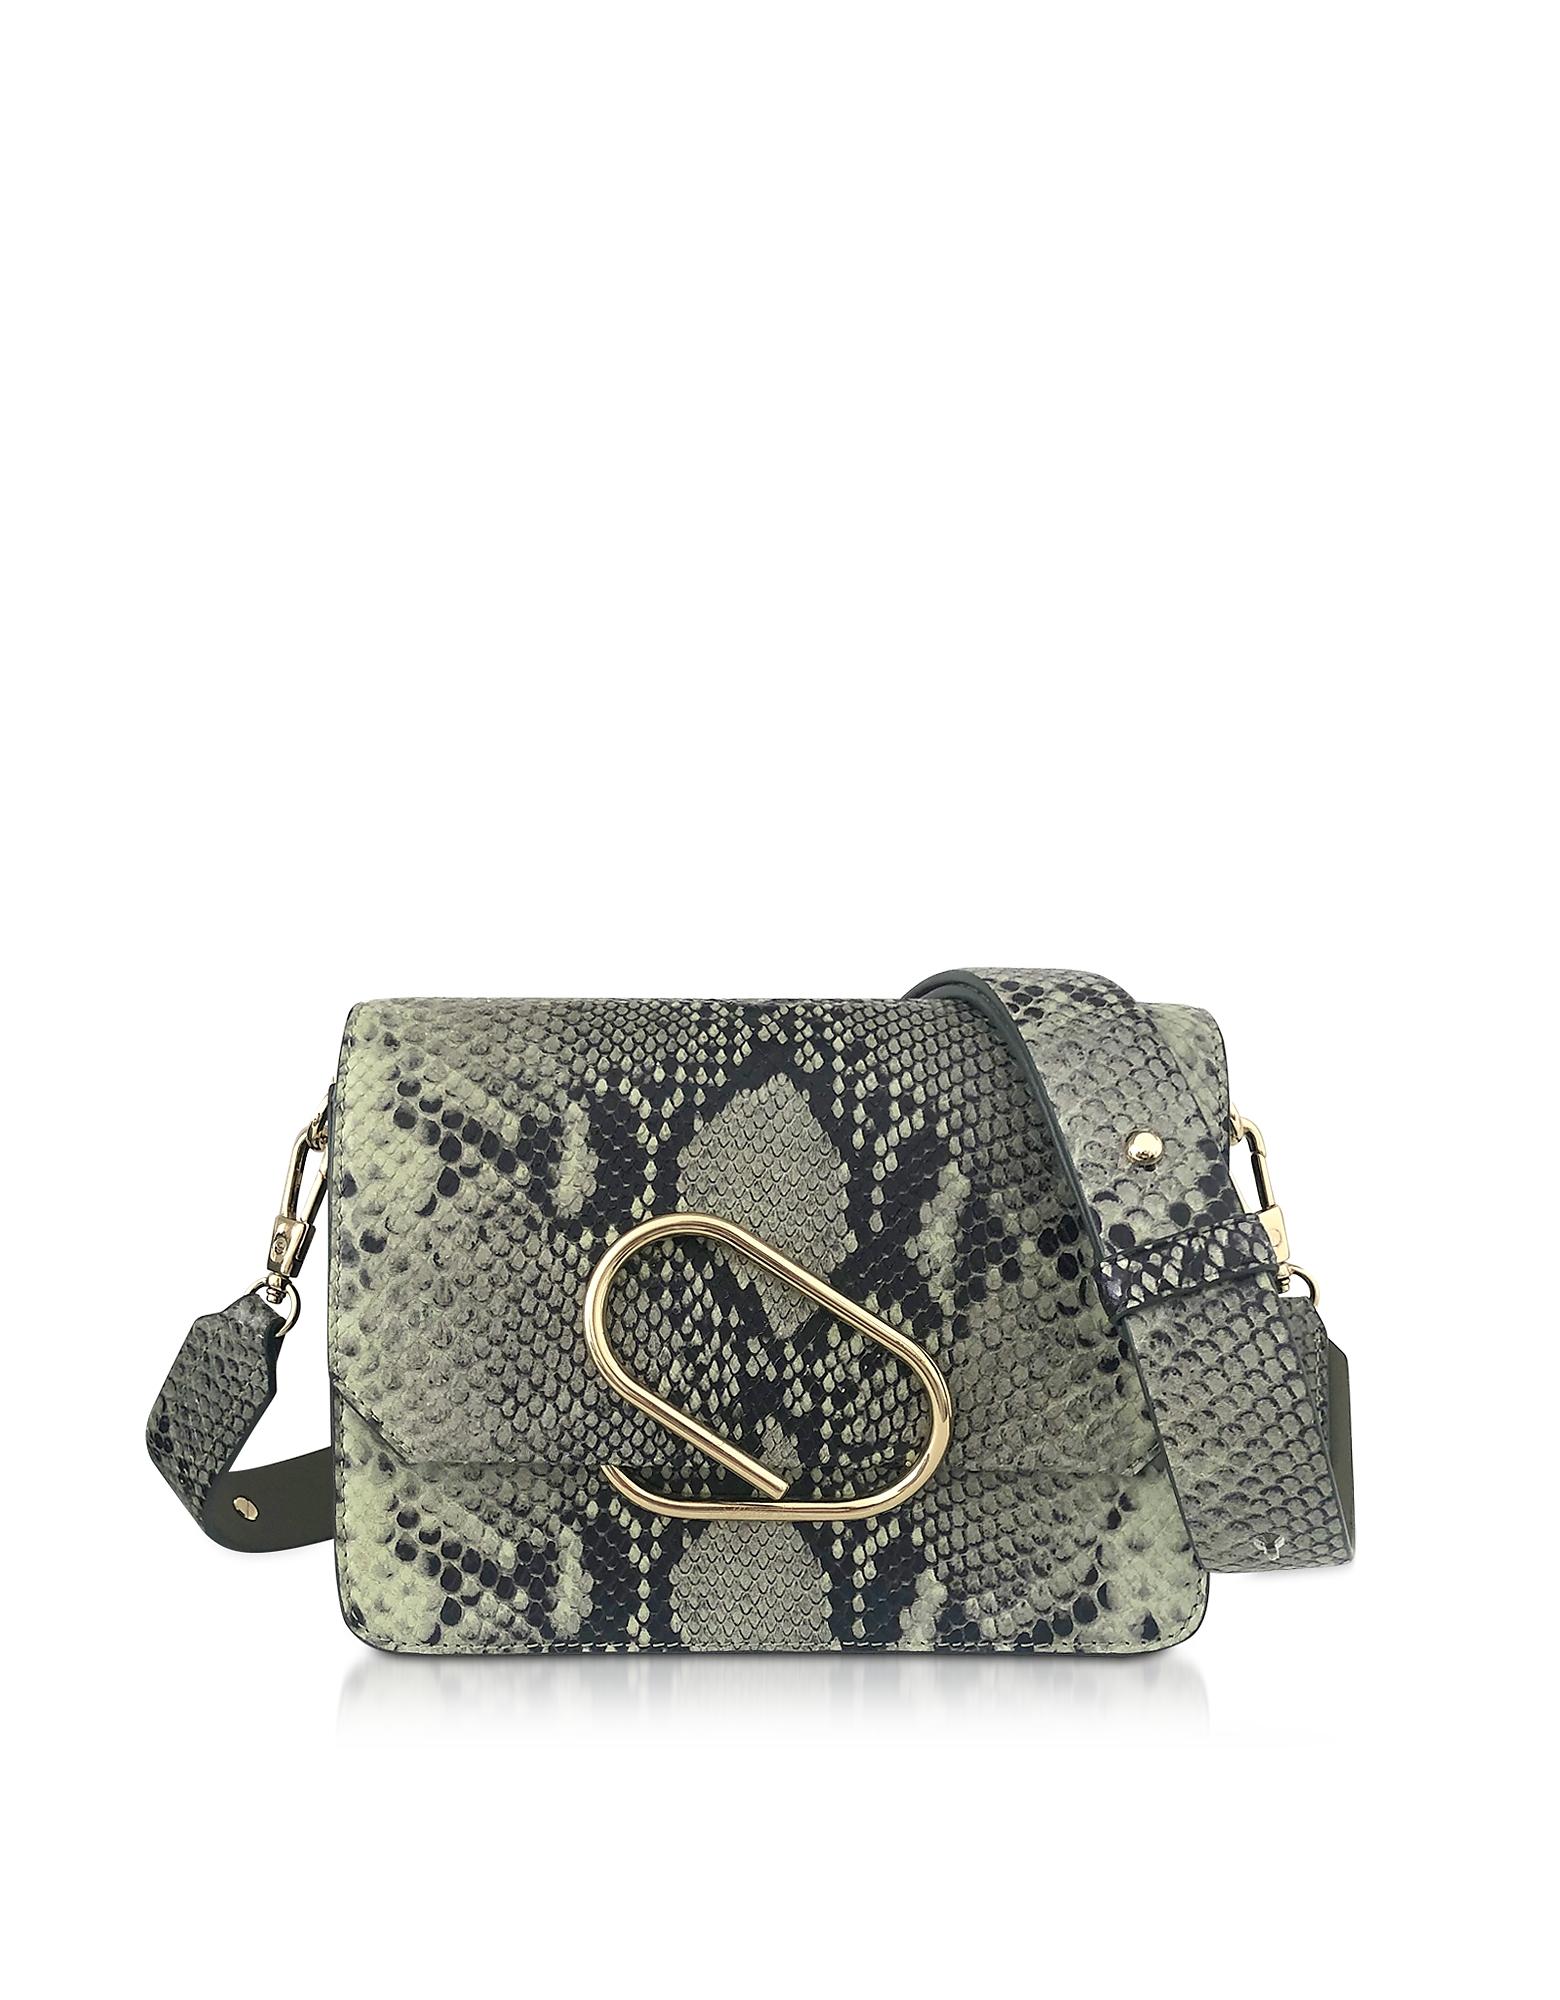 3.1 Phillip Lim  Handbags Animal Printed Leather Alix Mini Shoulder Bag